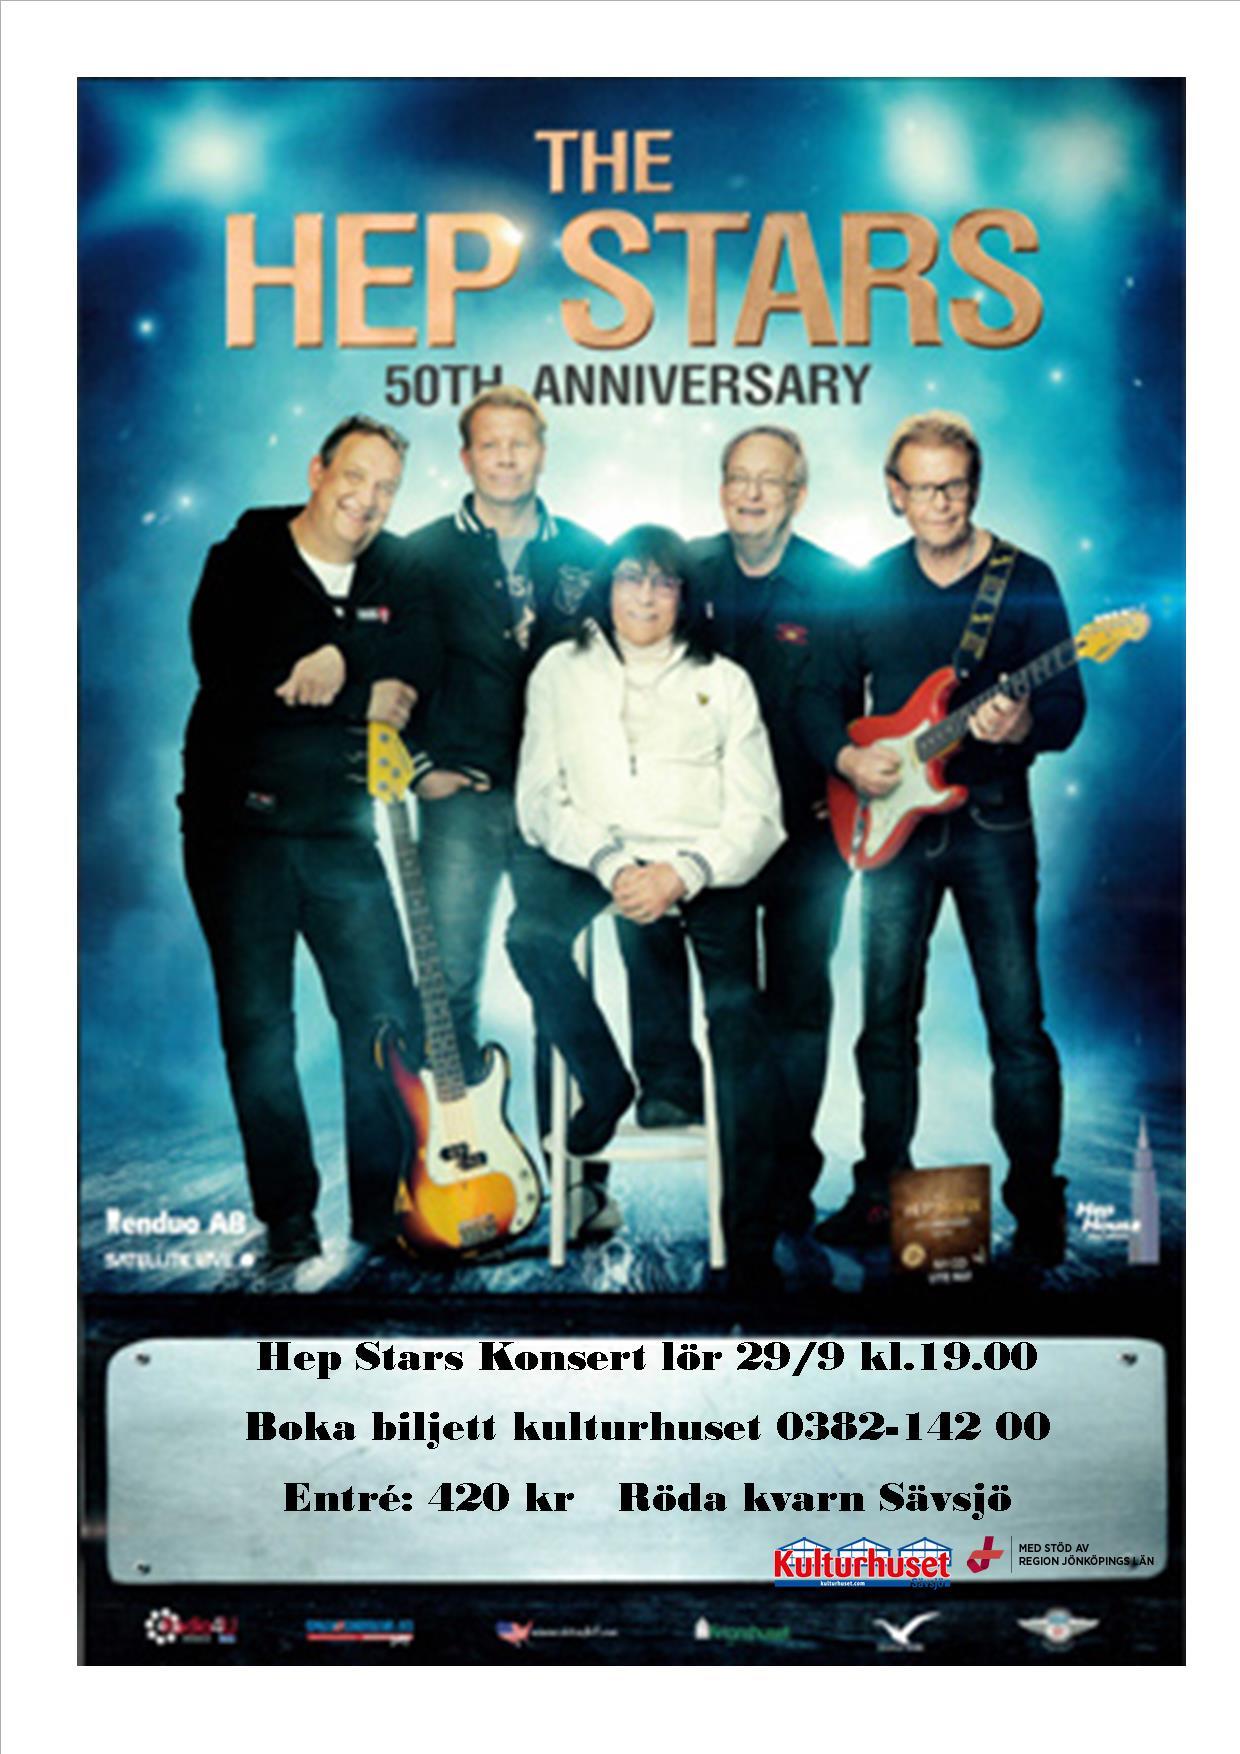 Hep Stars konsert